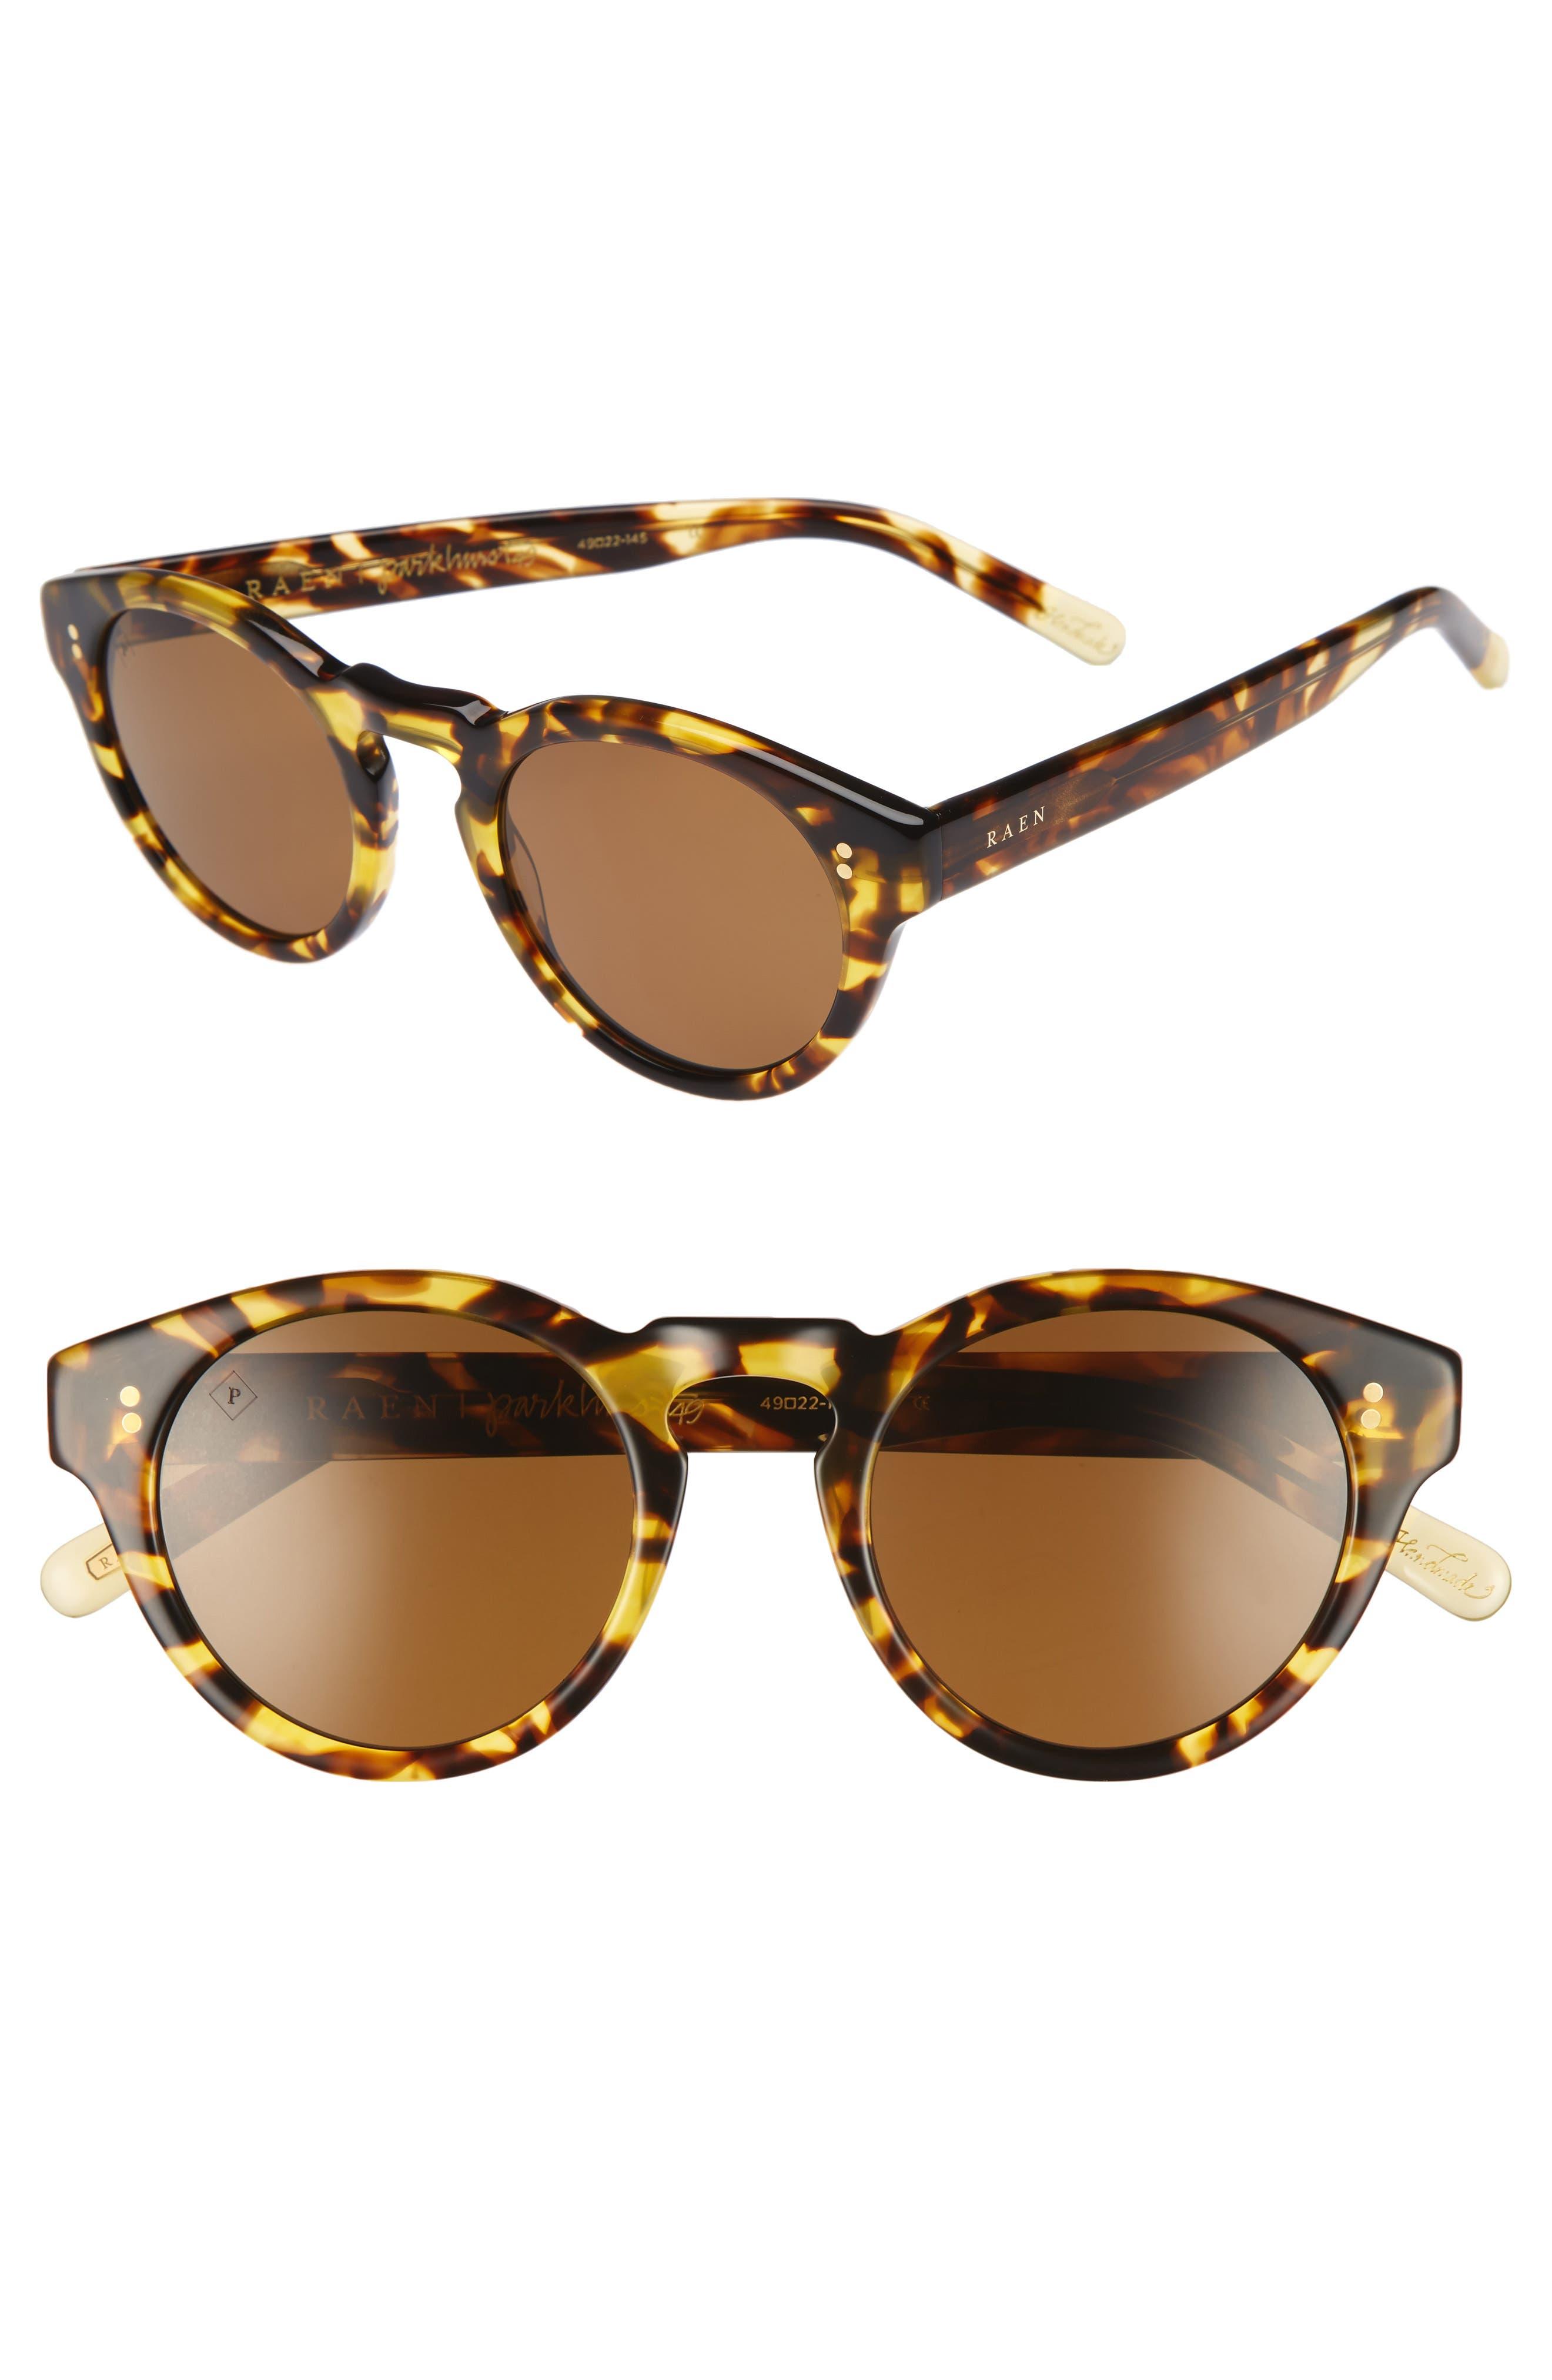 Parkhurst 49mm Sunglasses,                         Main,                         color, Tokyo Tortoise/ Brown